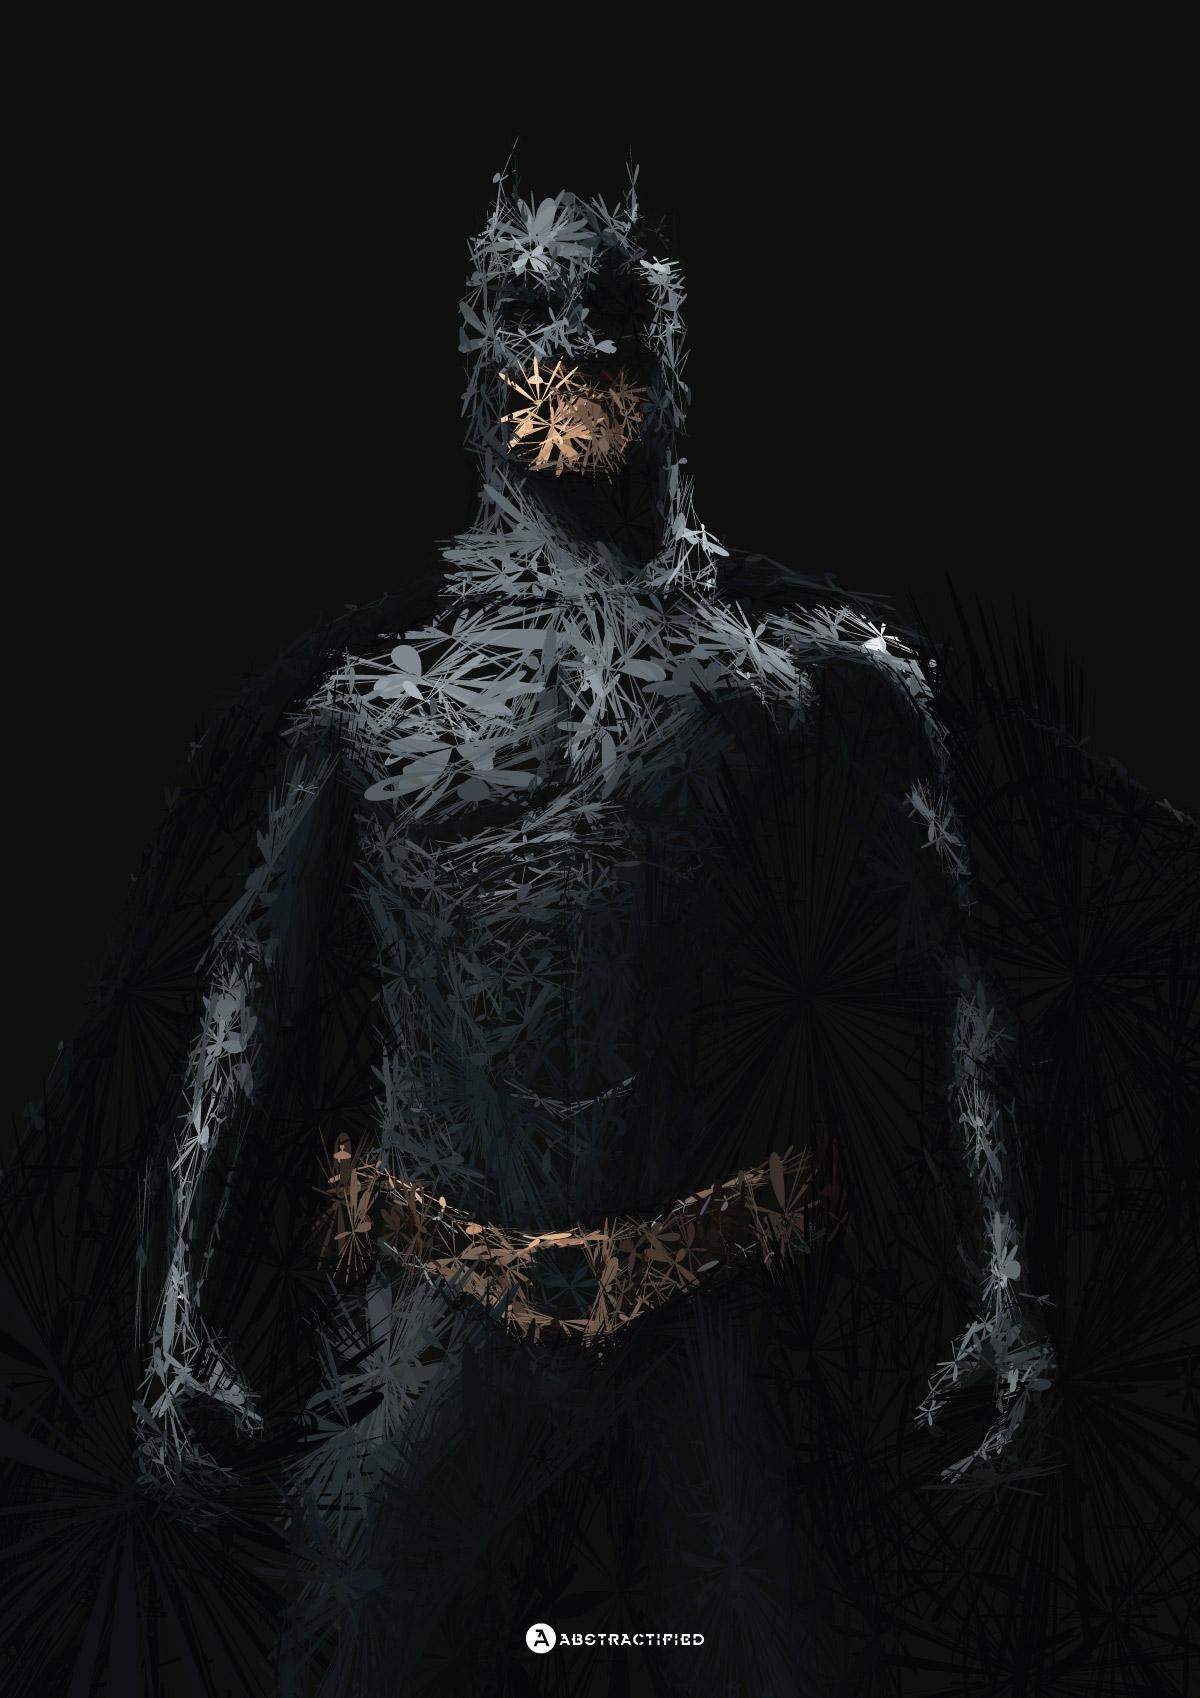 Abstractified Batman